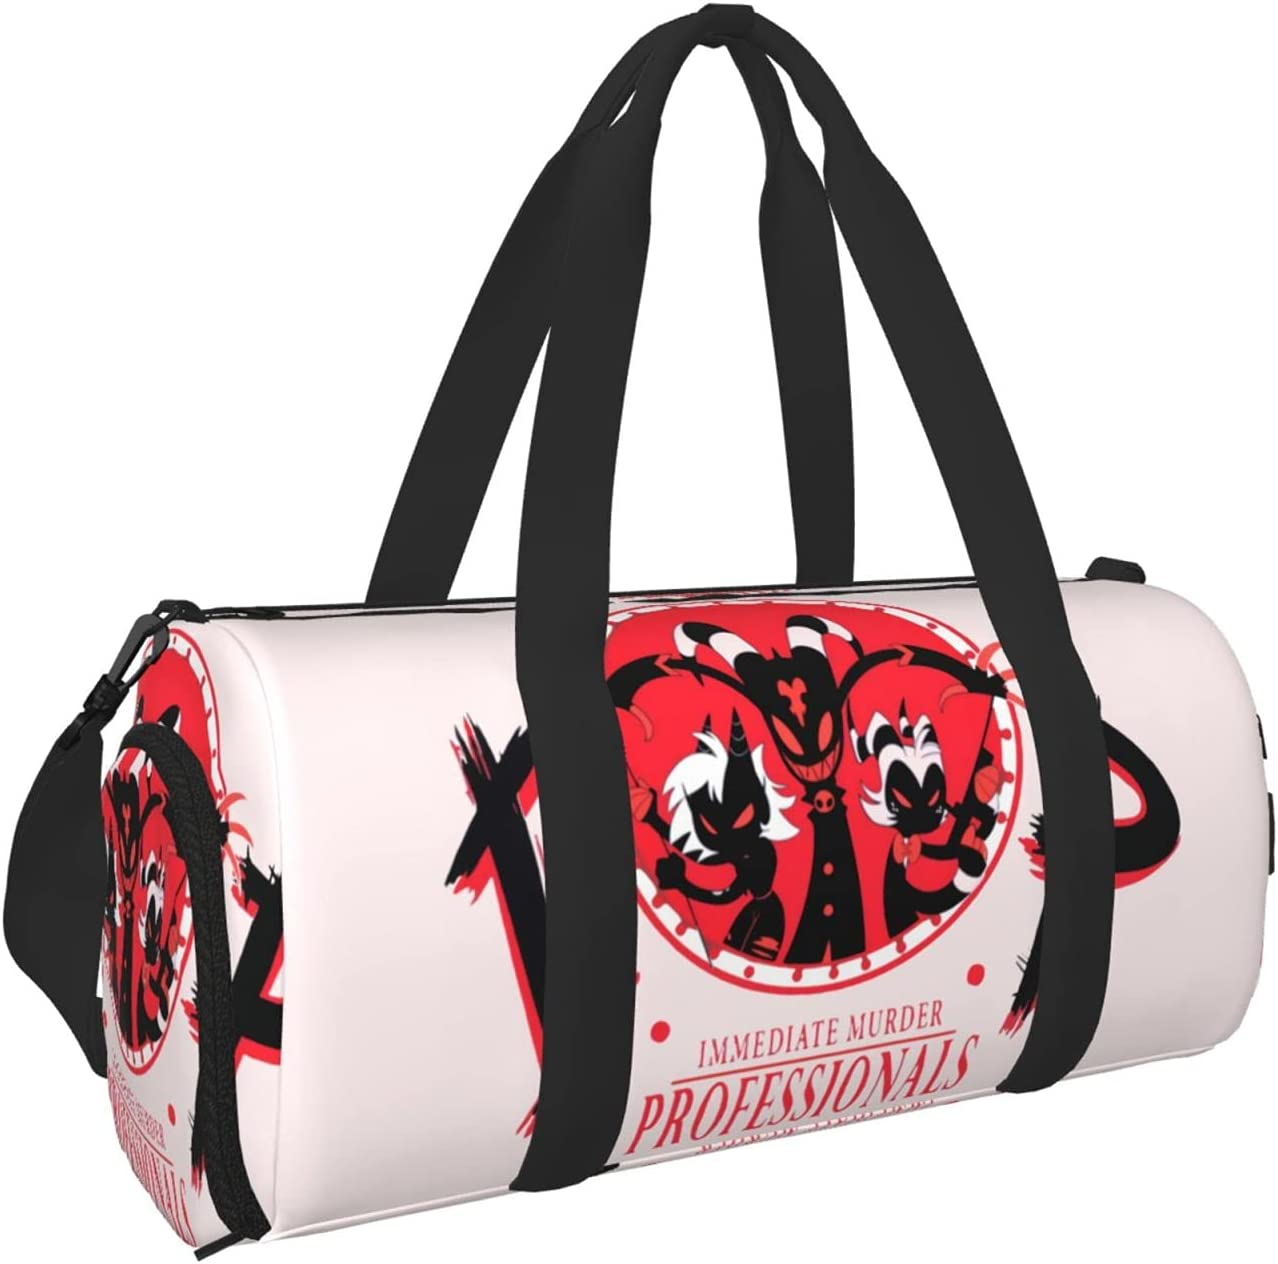 Chicago Mall Helluva Boss Sports Gym Duffel Bag Me Handbag Luggage Travel New Shipping Free Shipping For